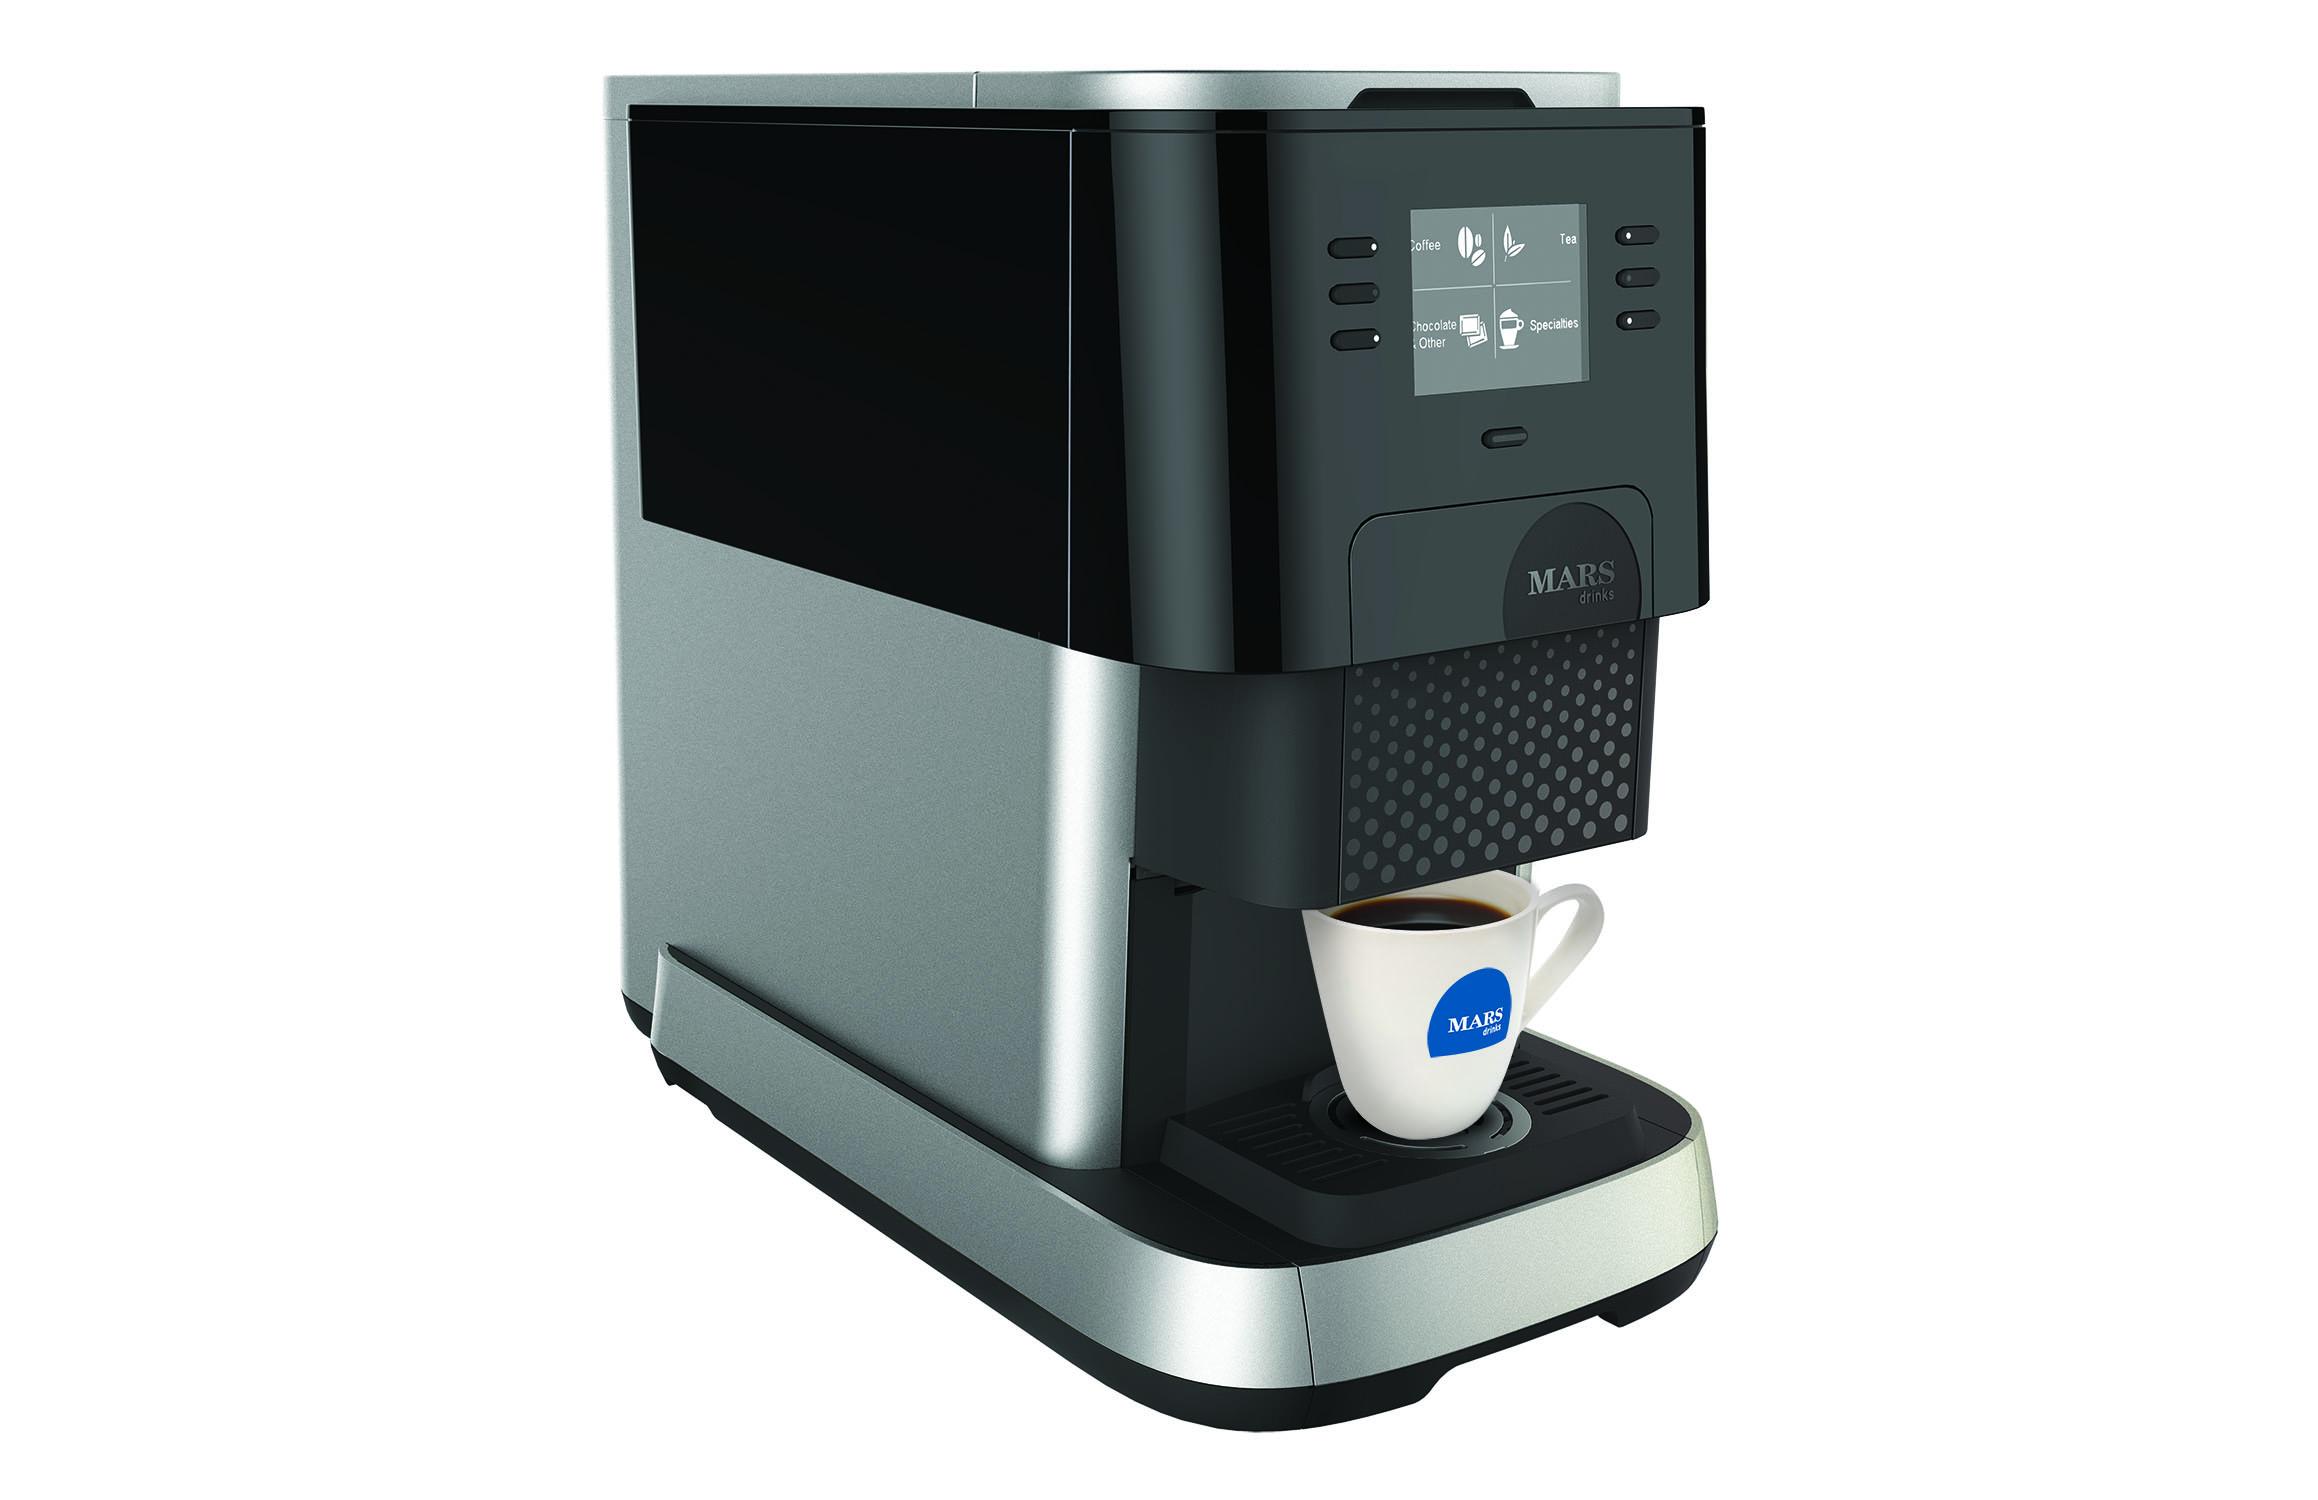 prd 6304215  chameleon renderingright perspectiveuknoglarecmyk Huge Coffee Office Coffee Services Office Coffee Machine